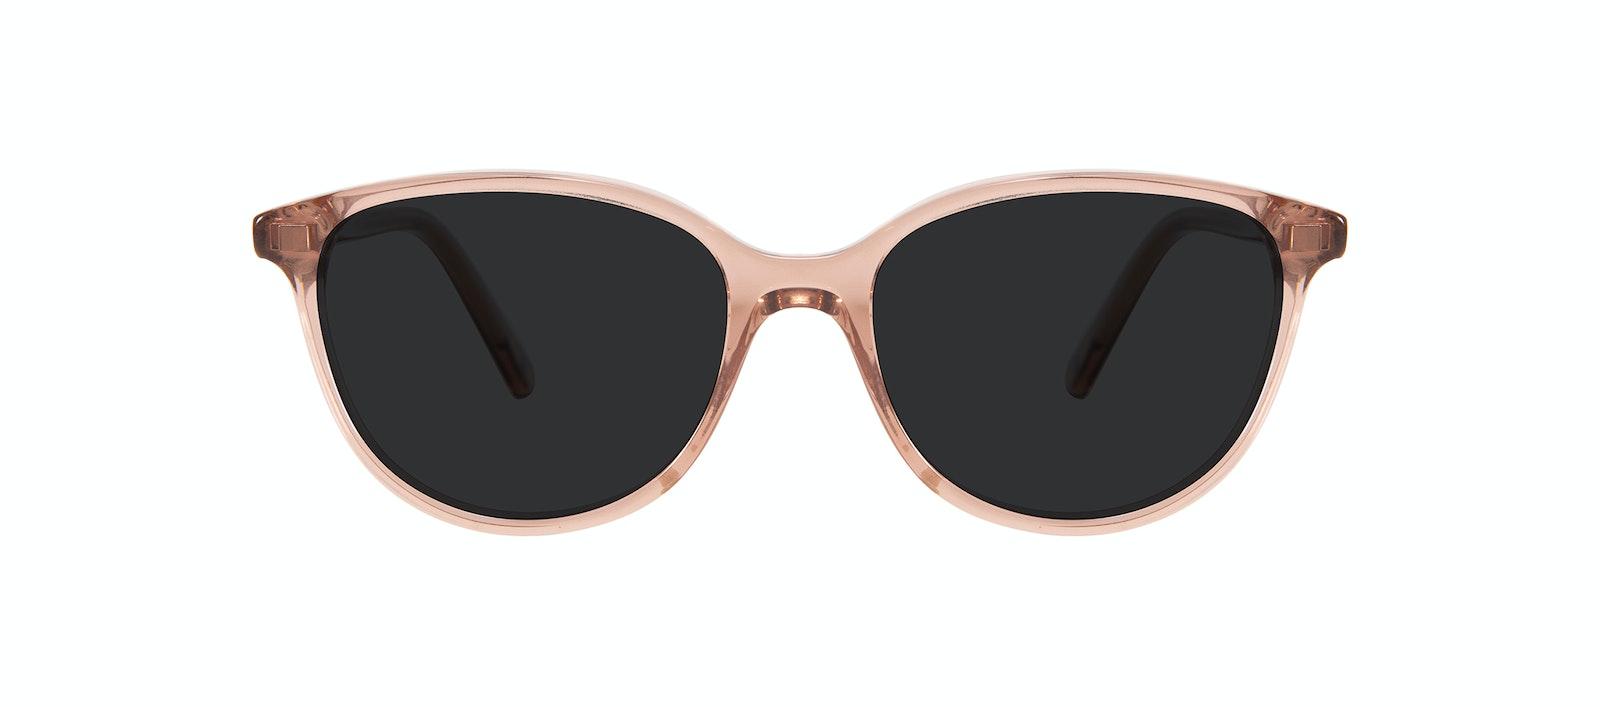 Affordable Fashion Glasses Cat Eye Sunglasses Kids Imagine Junior Rose Front